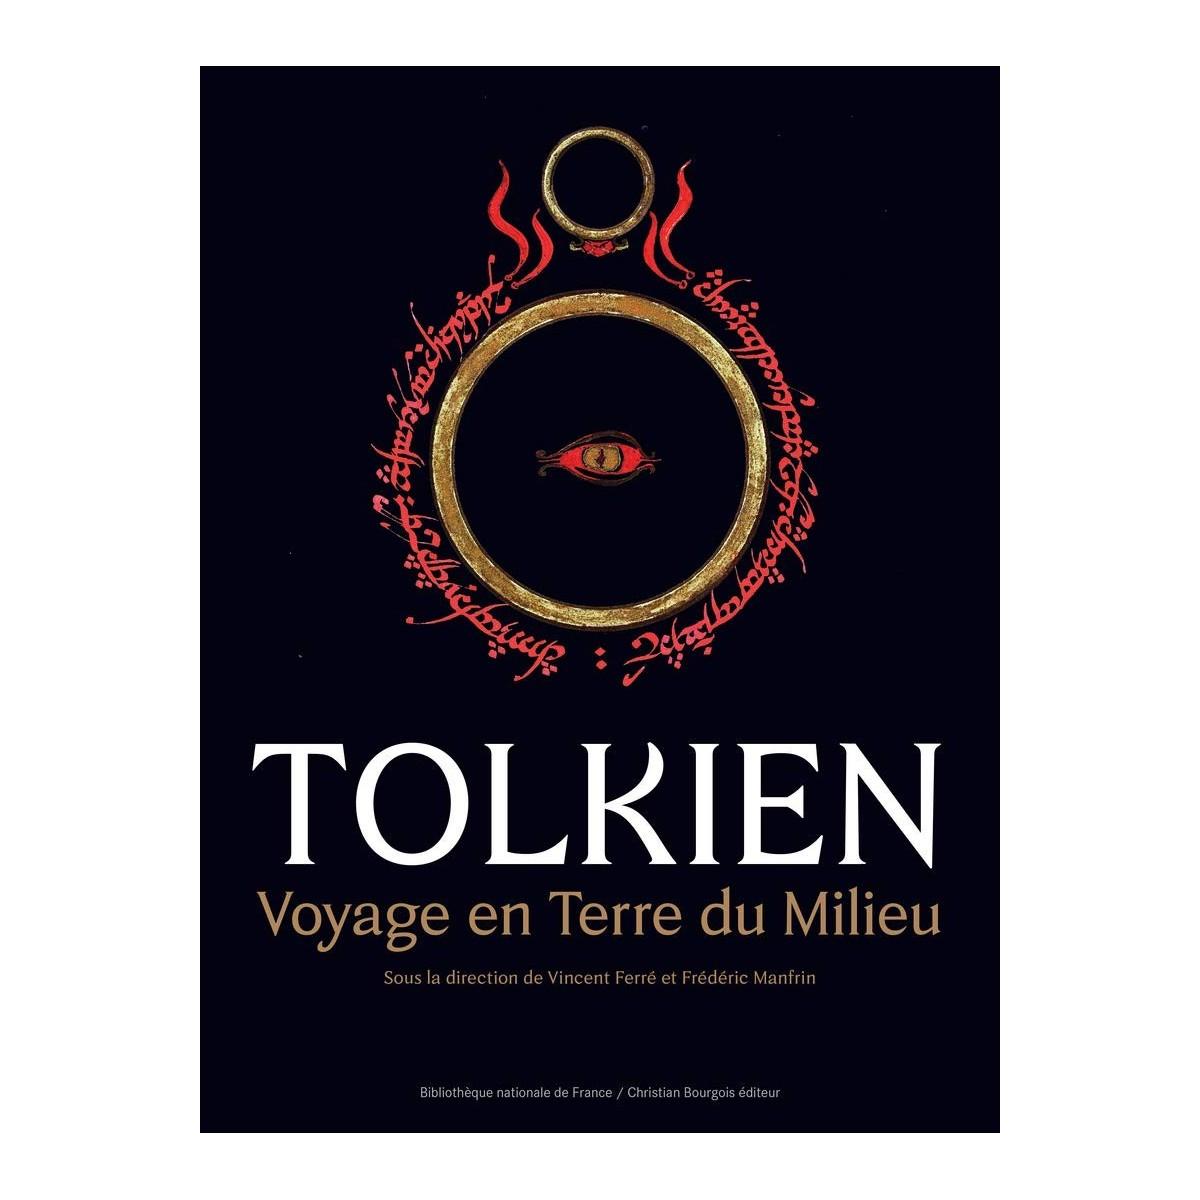 Tolkien - Voyage en Terre du Milieu (french)